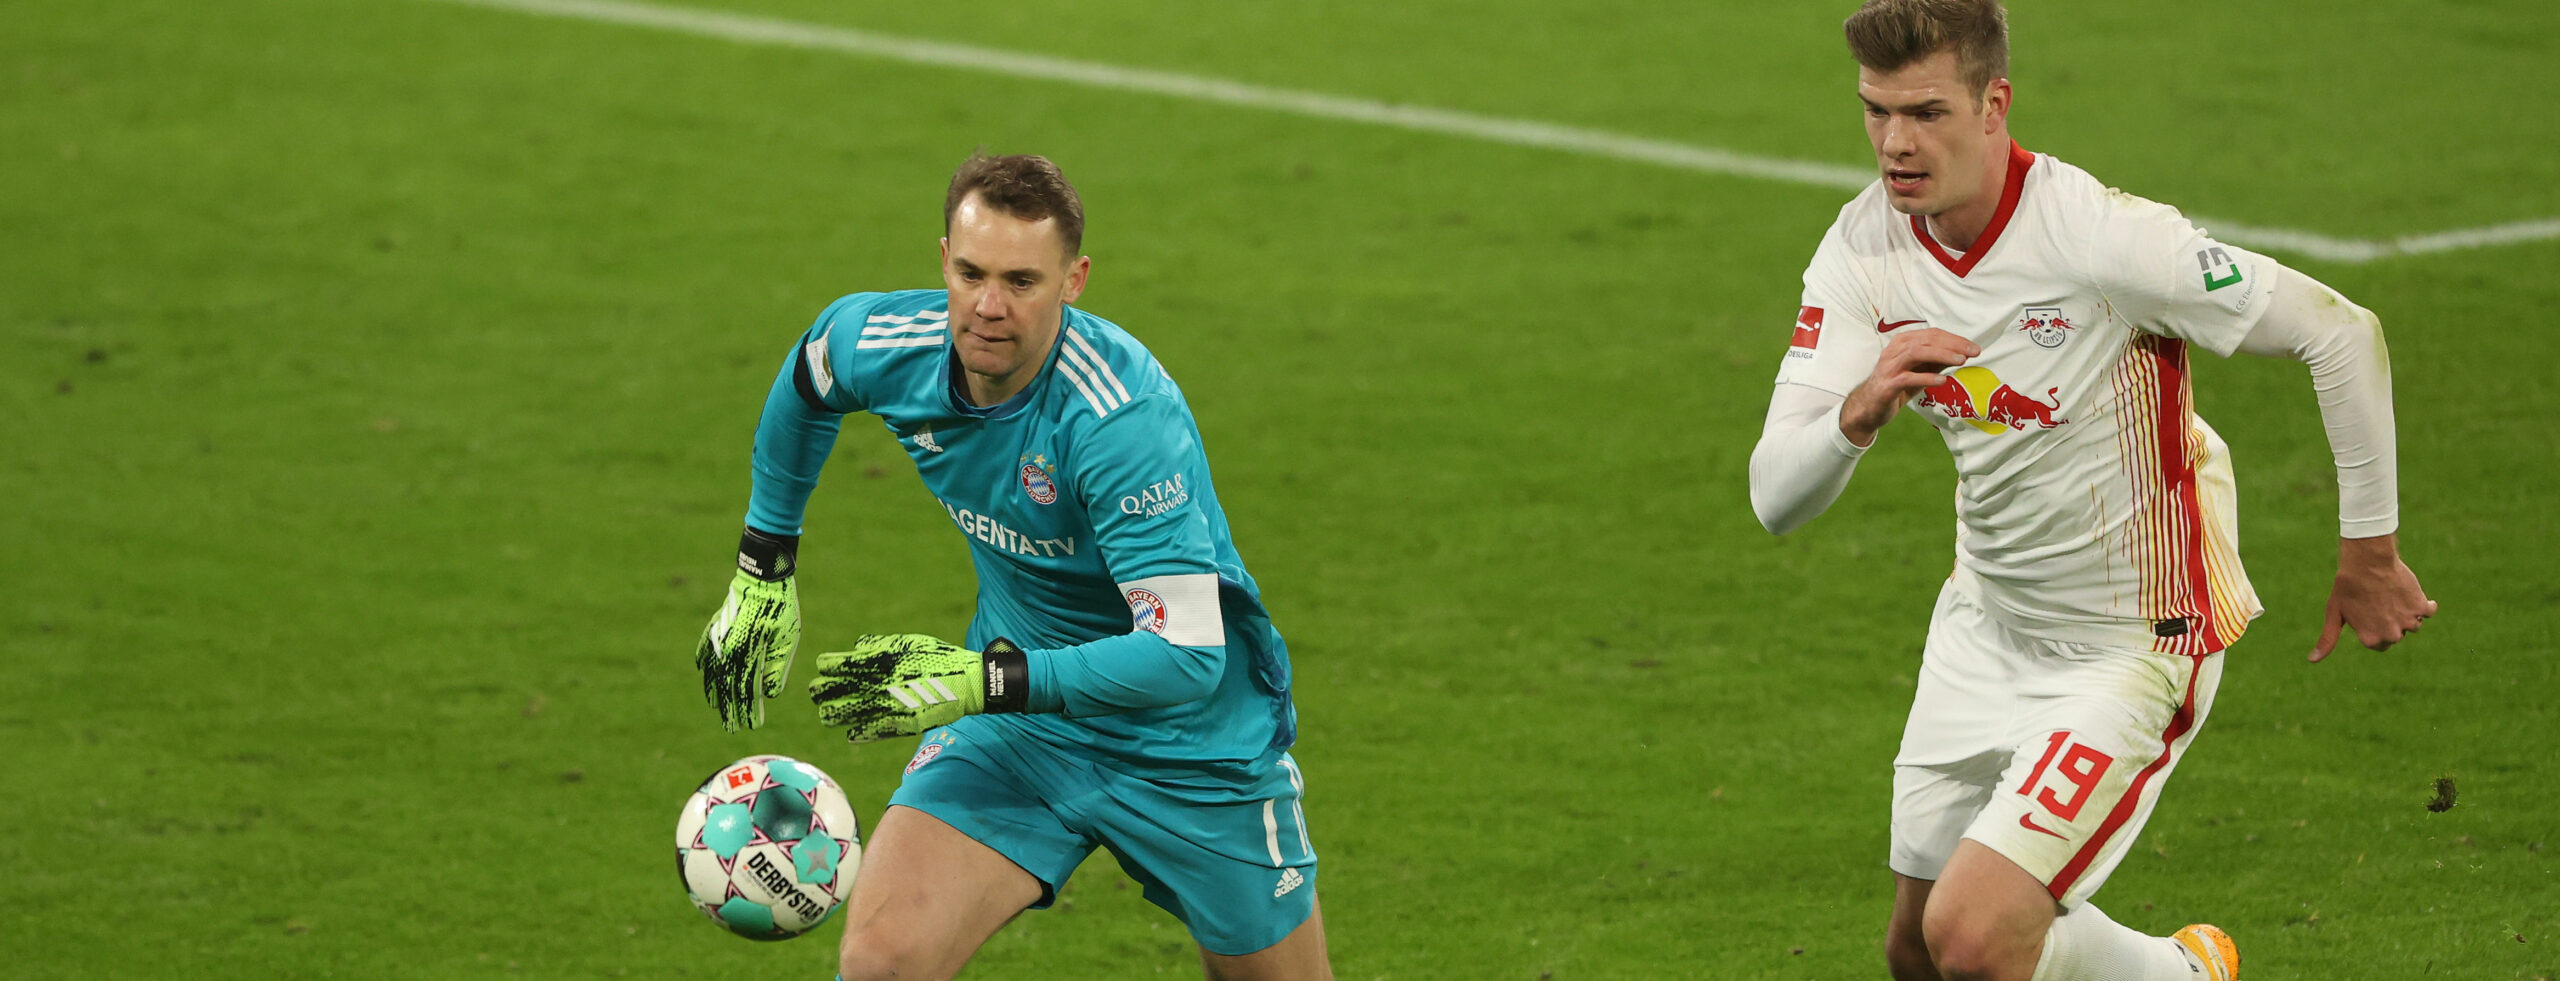 RB Leipzig vs Bayern Munich: Value with underdogs in crunch clash